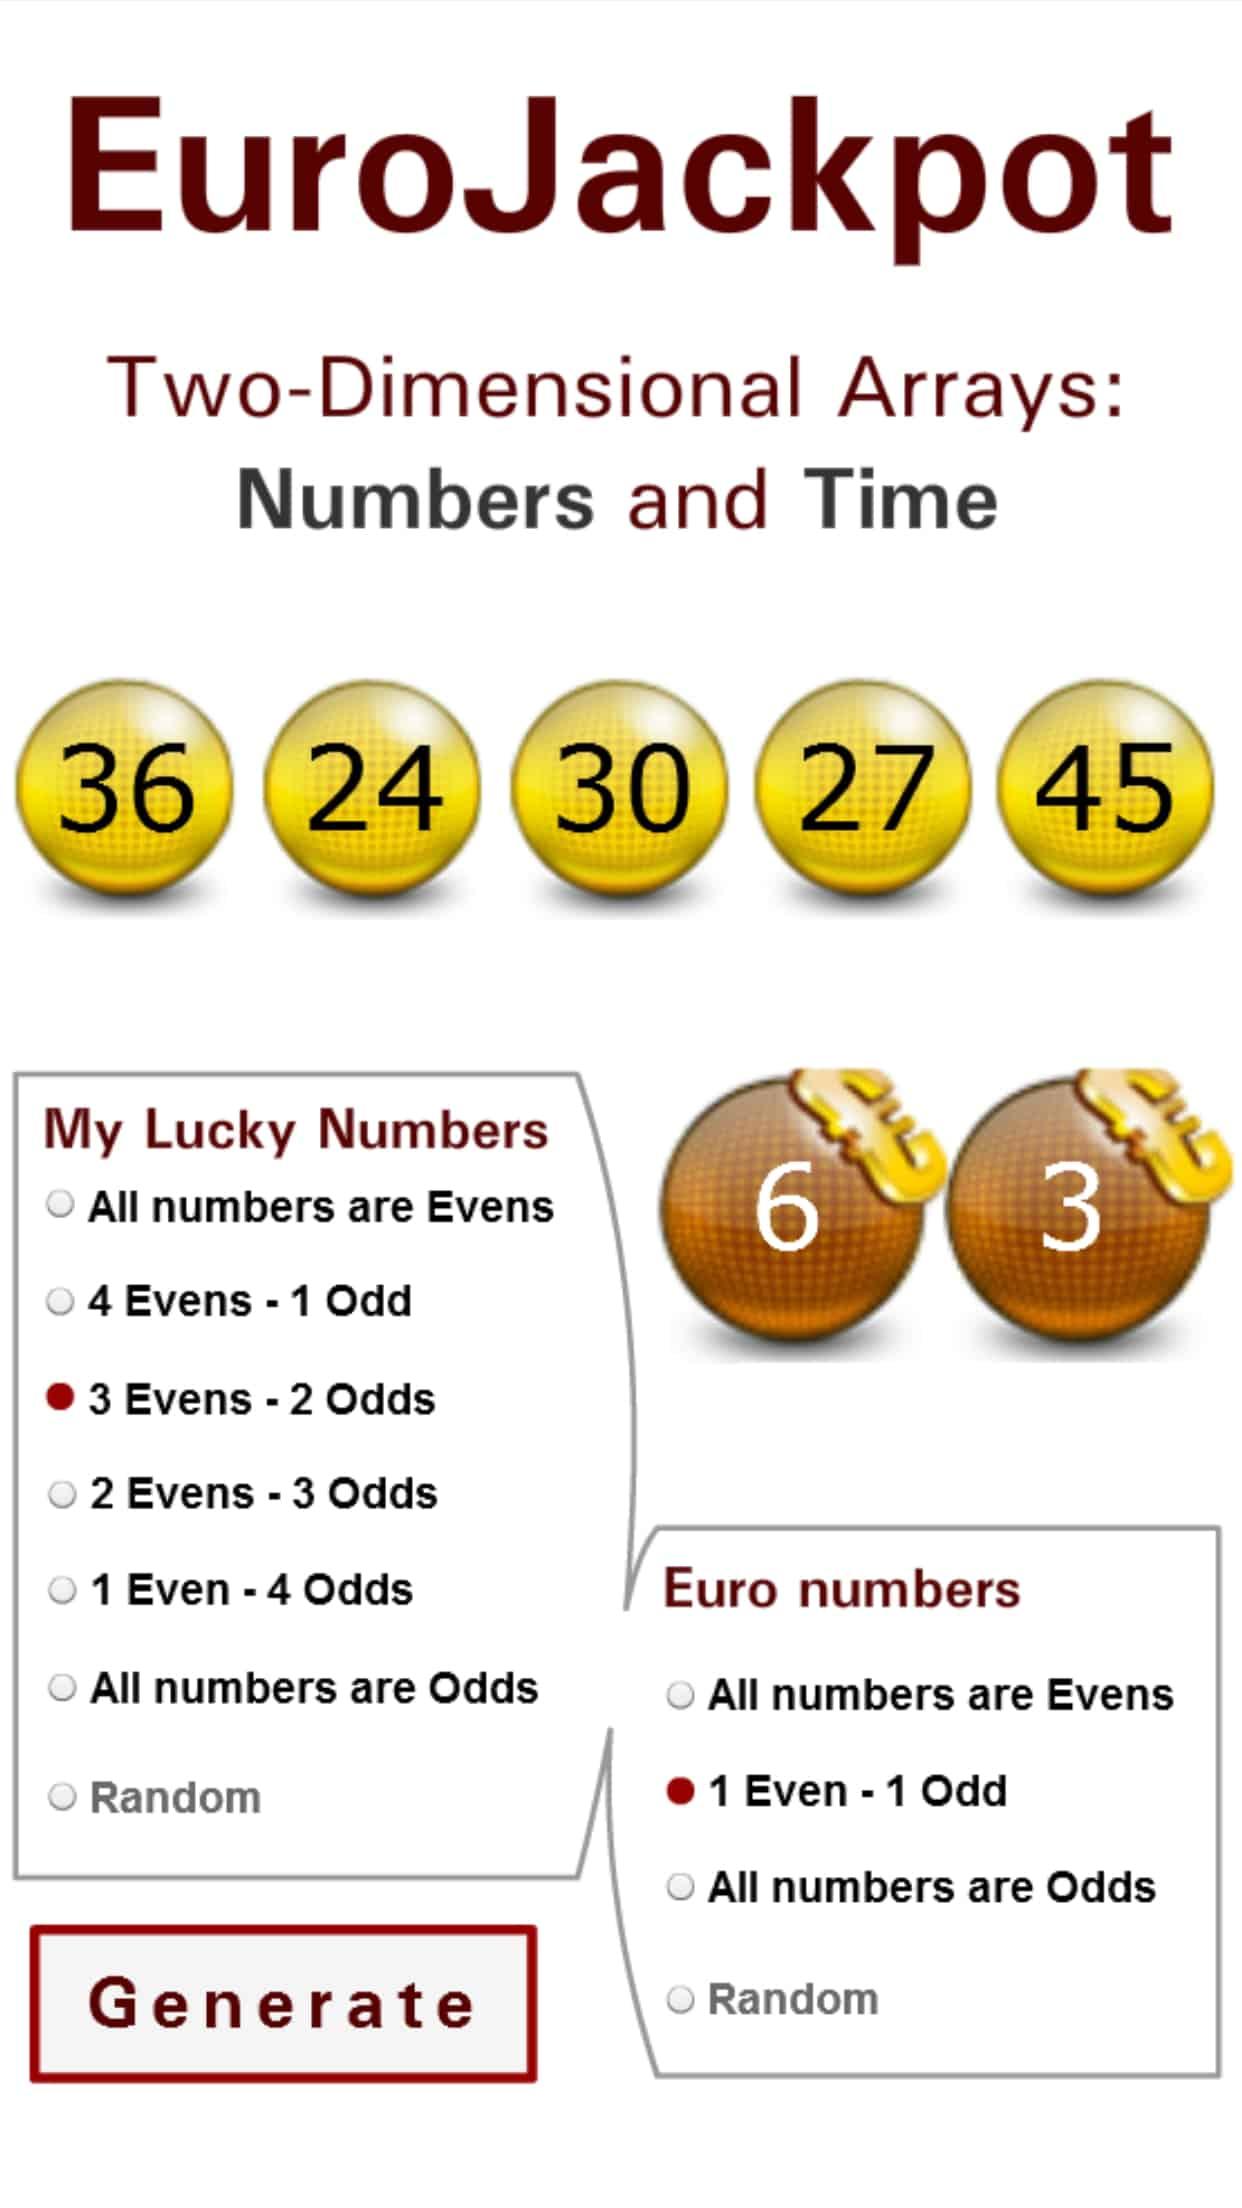 EuroJackpot - Results, Tips & Winning Numbers